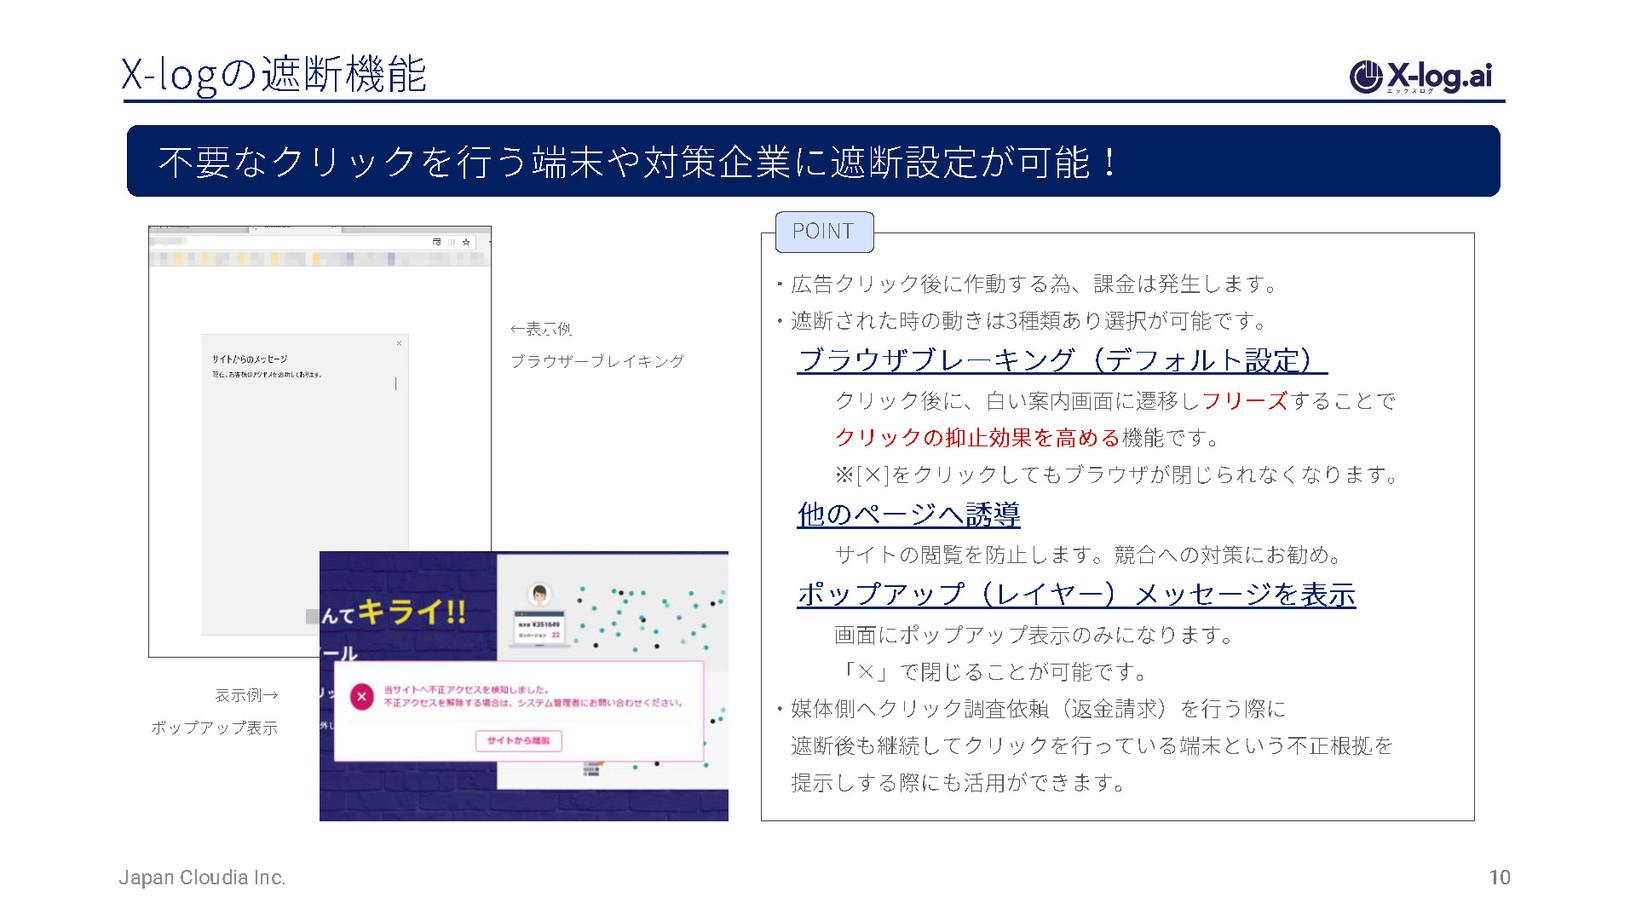 X-log.aiご案内資料_ページ_10.jpg